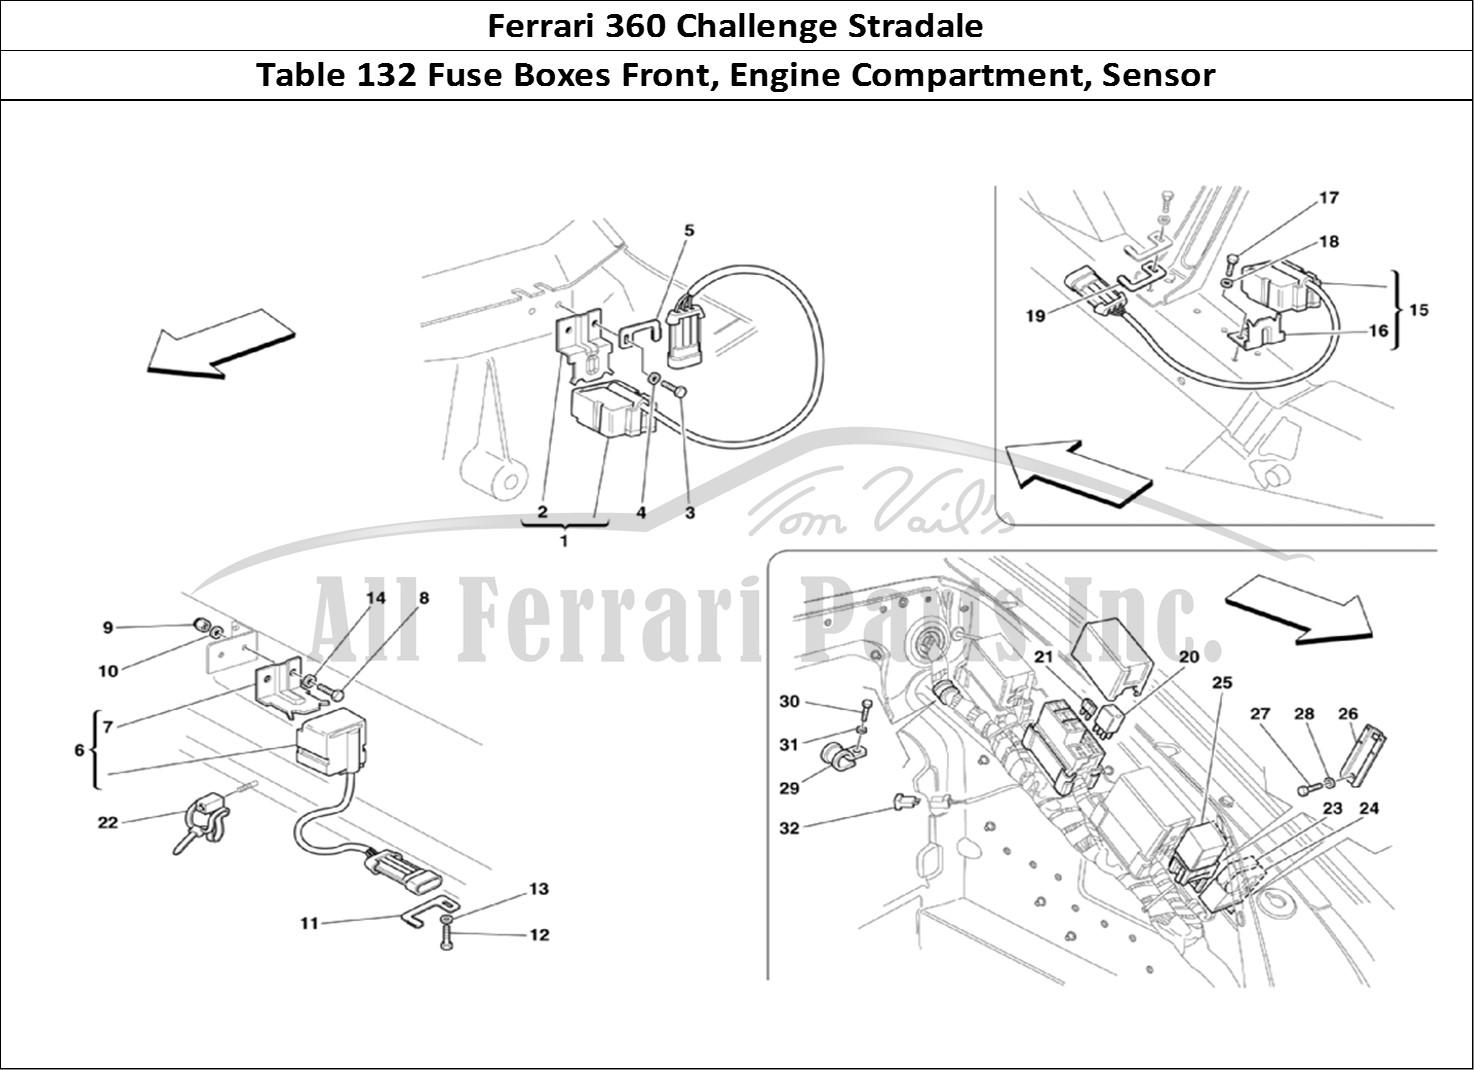 Buy Original Ferrari 360 Challenge Stradale 132 Fuse Boxes Front Engine Diagram Bodywork Table Compartment Sensor